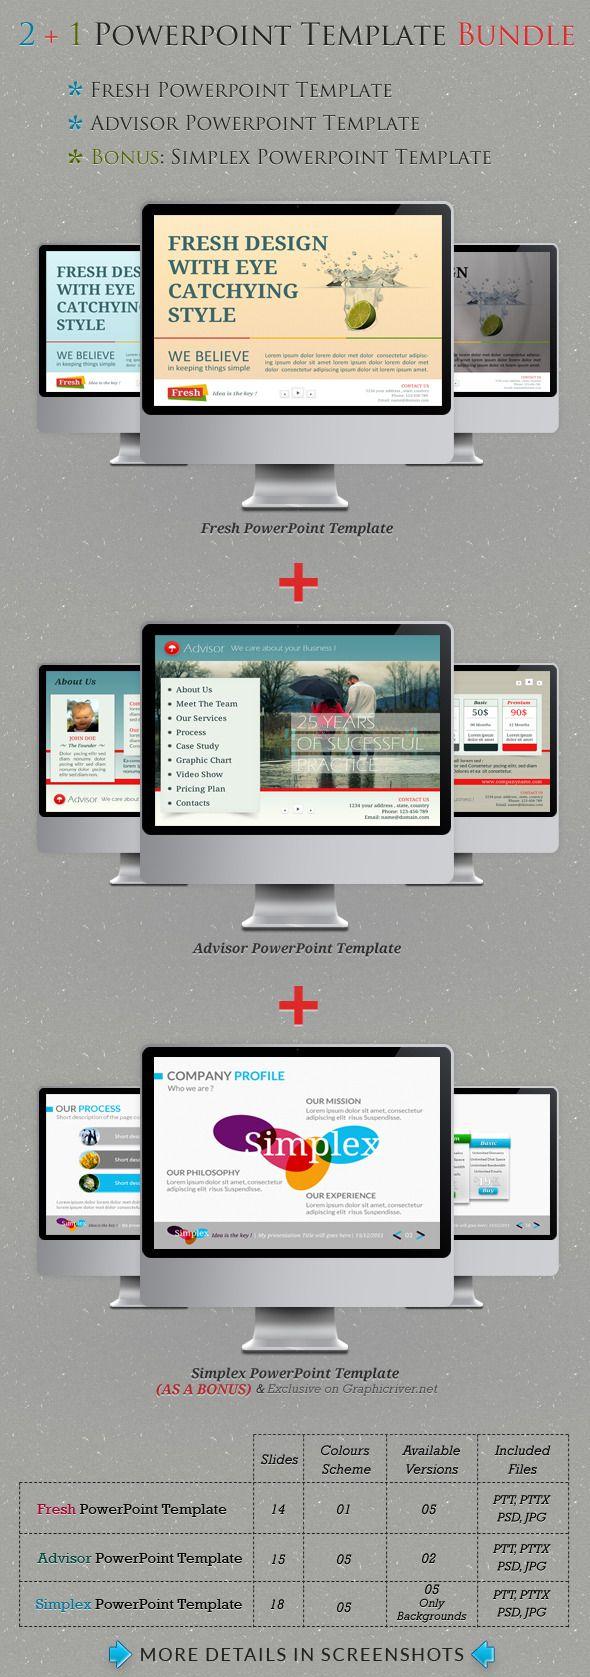 621 best Powerpoint Templates images on Pinterest | Font logo, Power ...